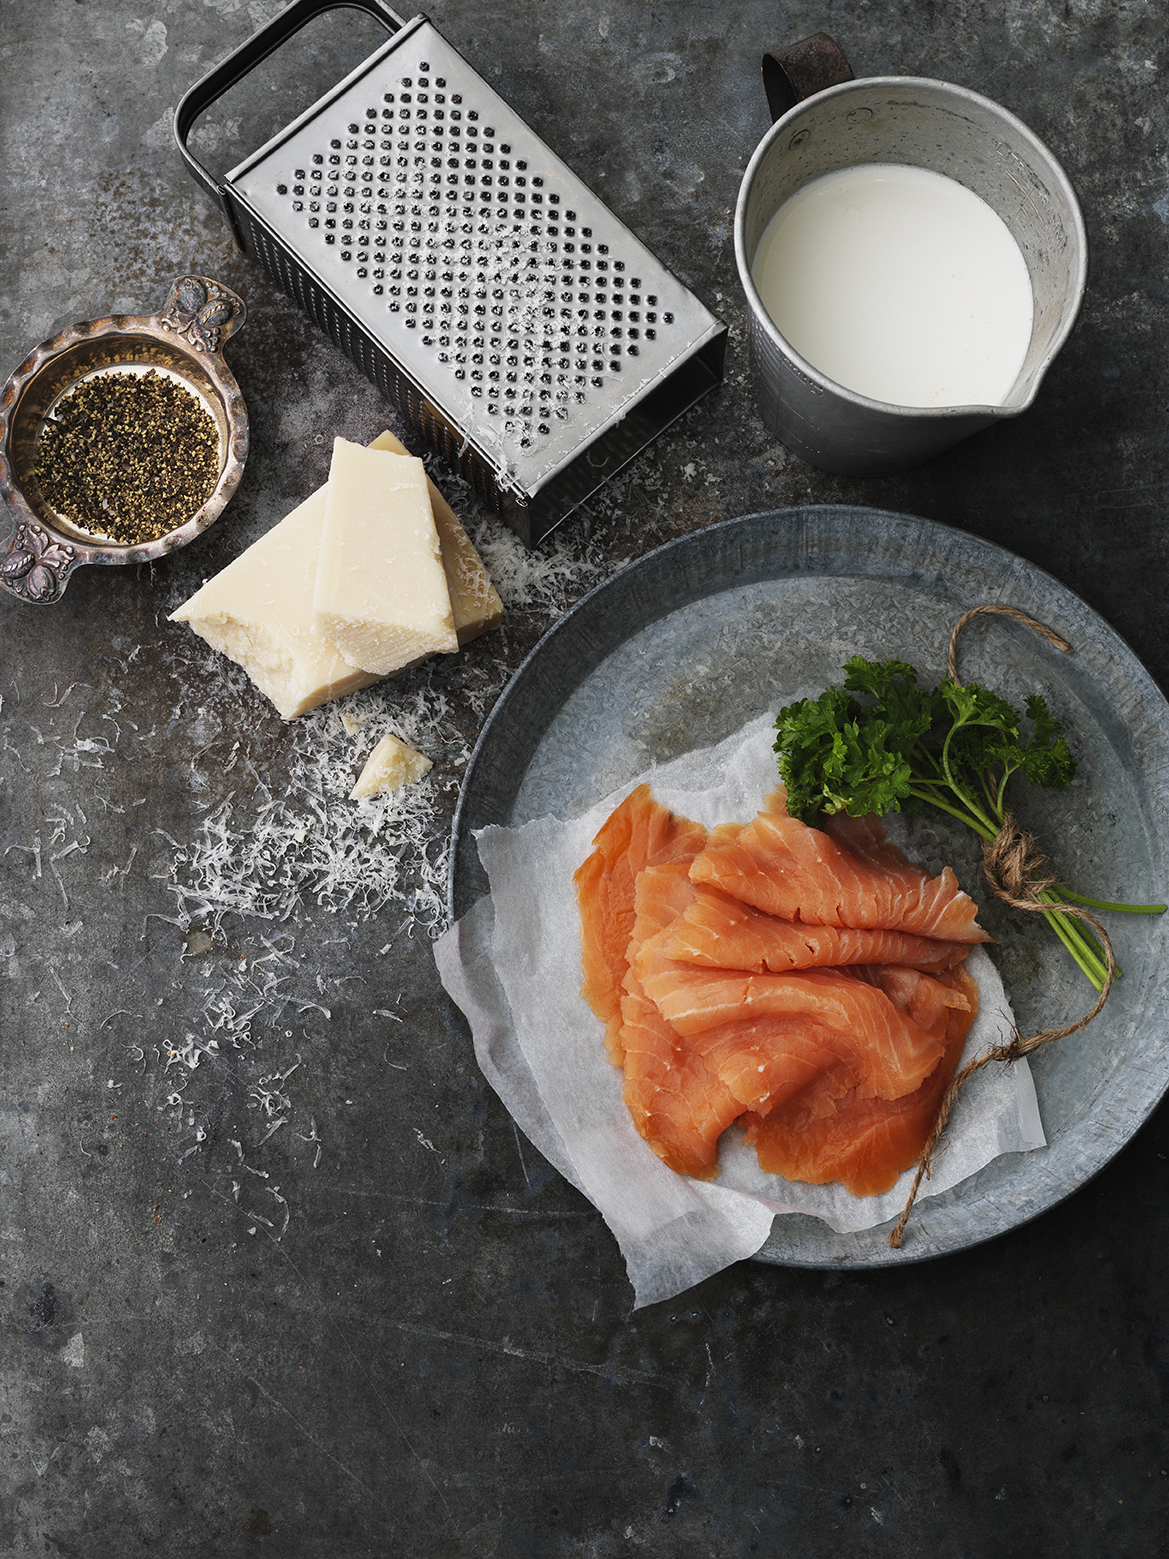 Catch Of The Day Food Creator And Stylist Becca Sulocki